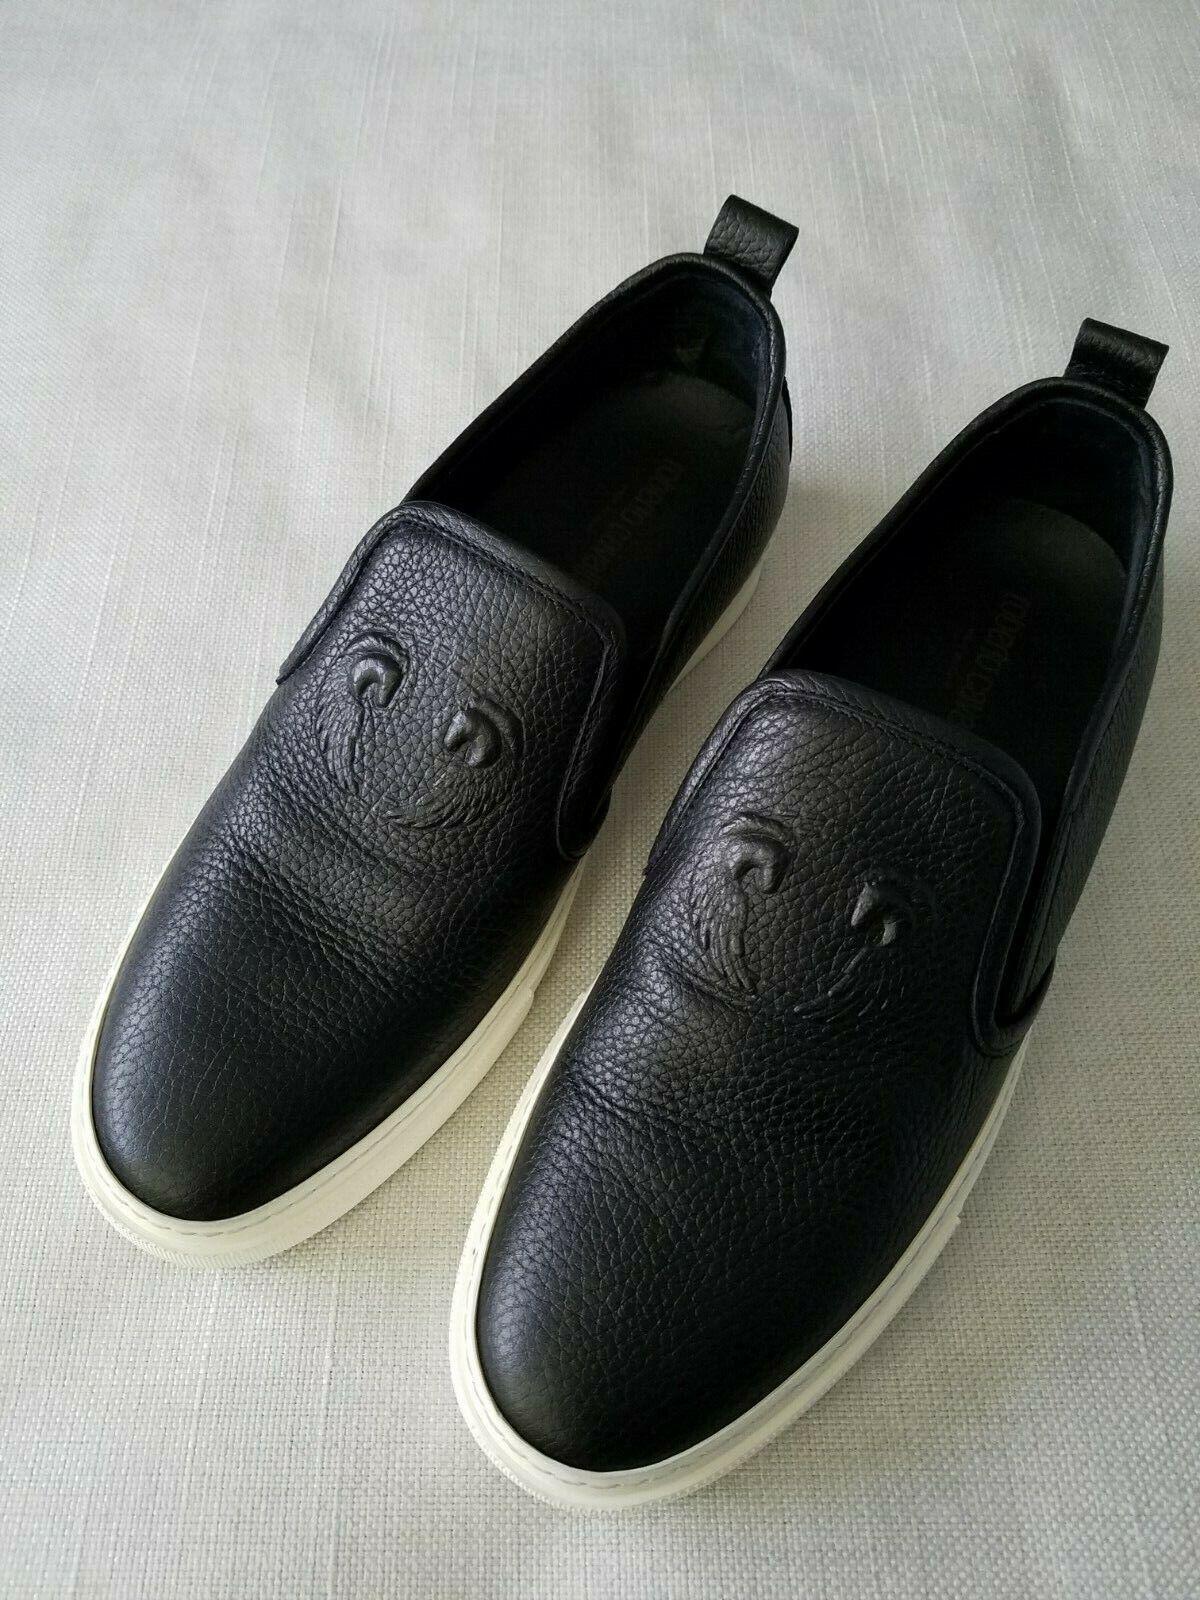 New Mens  Roberto Cavalli  Leather Casual scarpe